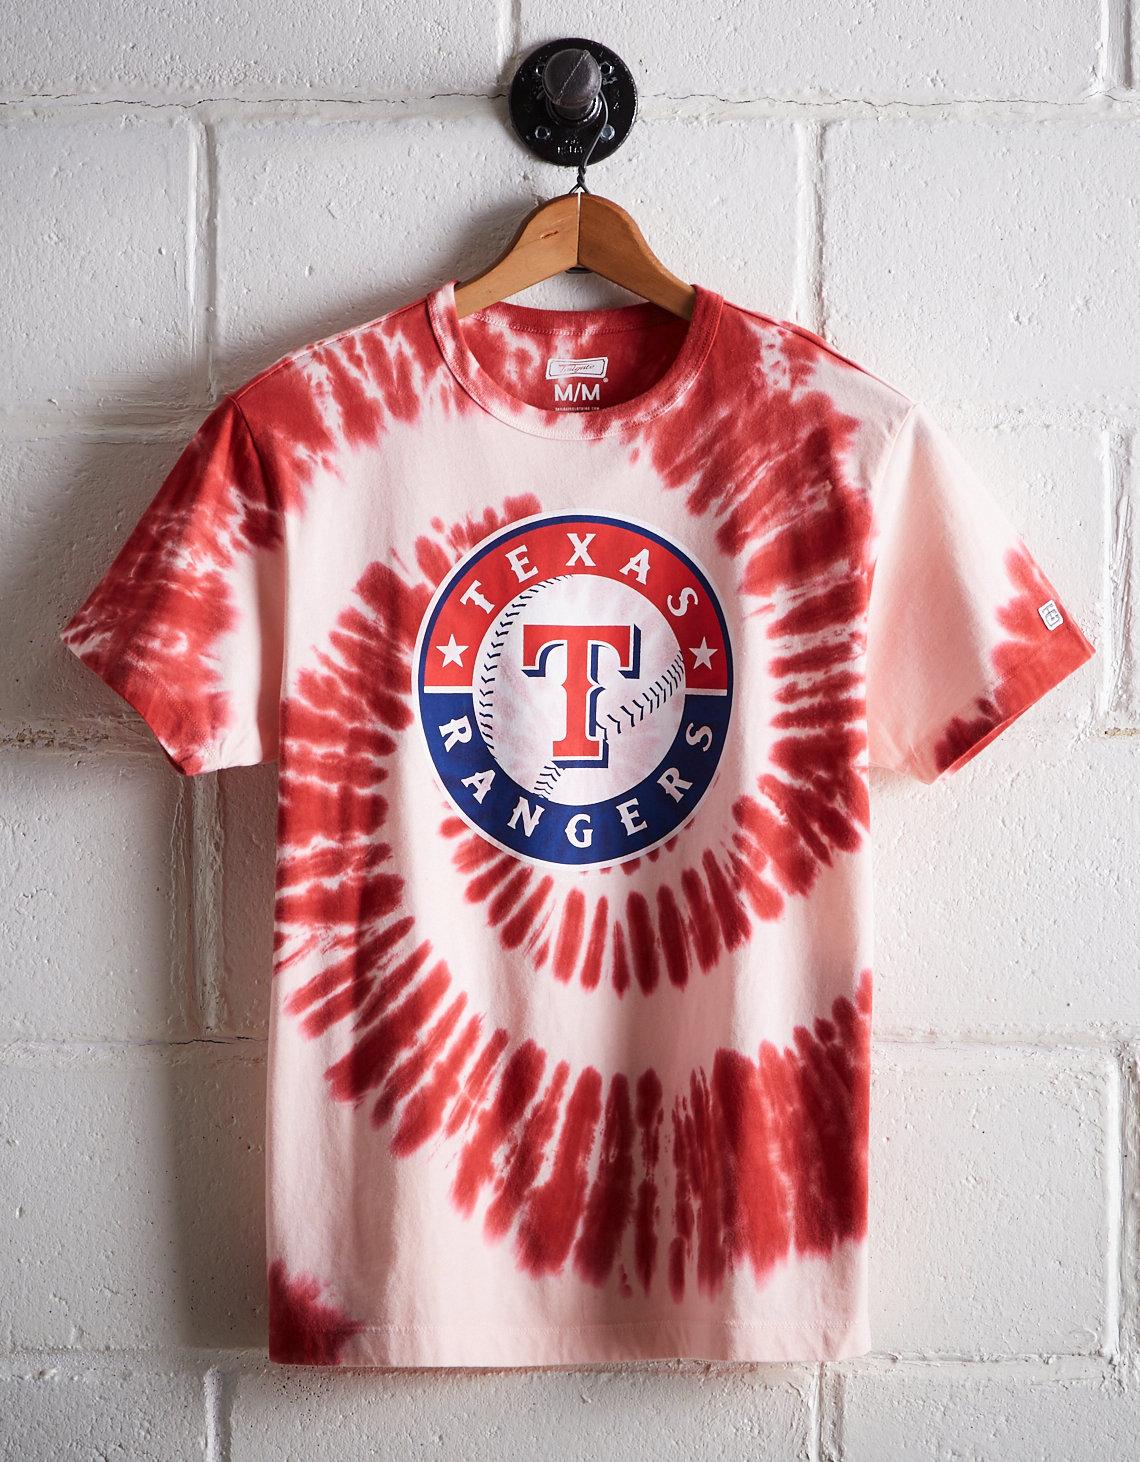 35ac515d0df Tailgate Men s Texas Rangers Tie-Dye T-Shirt